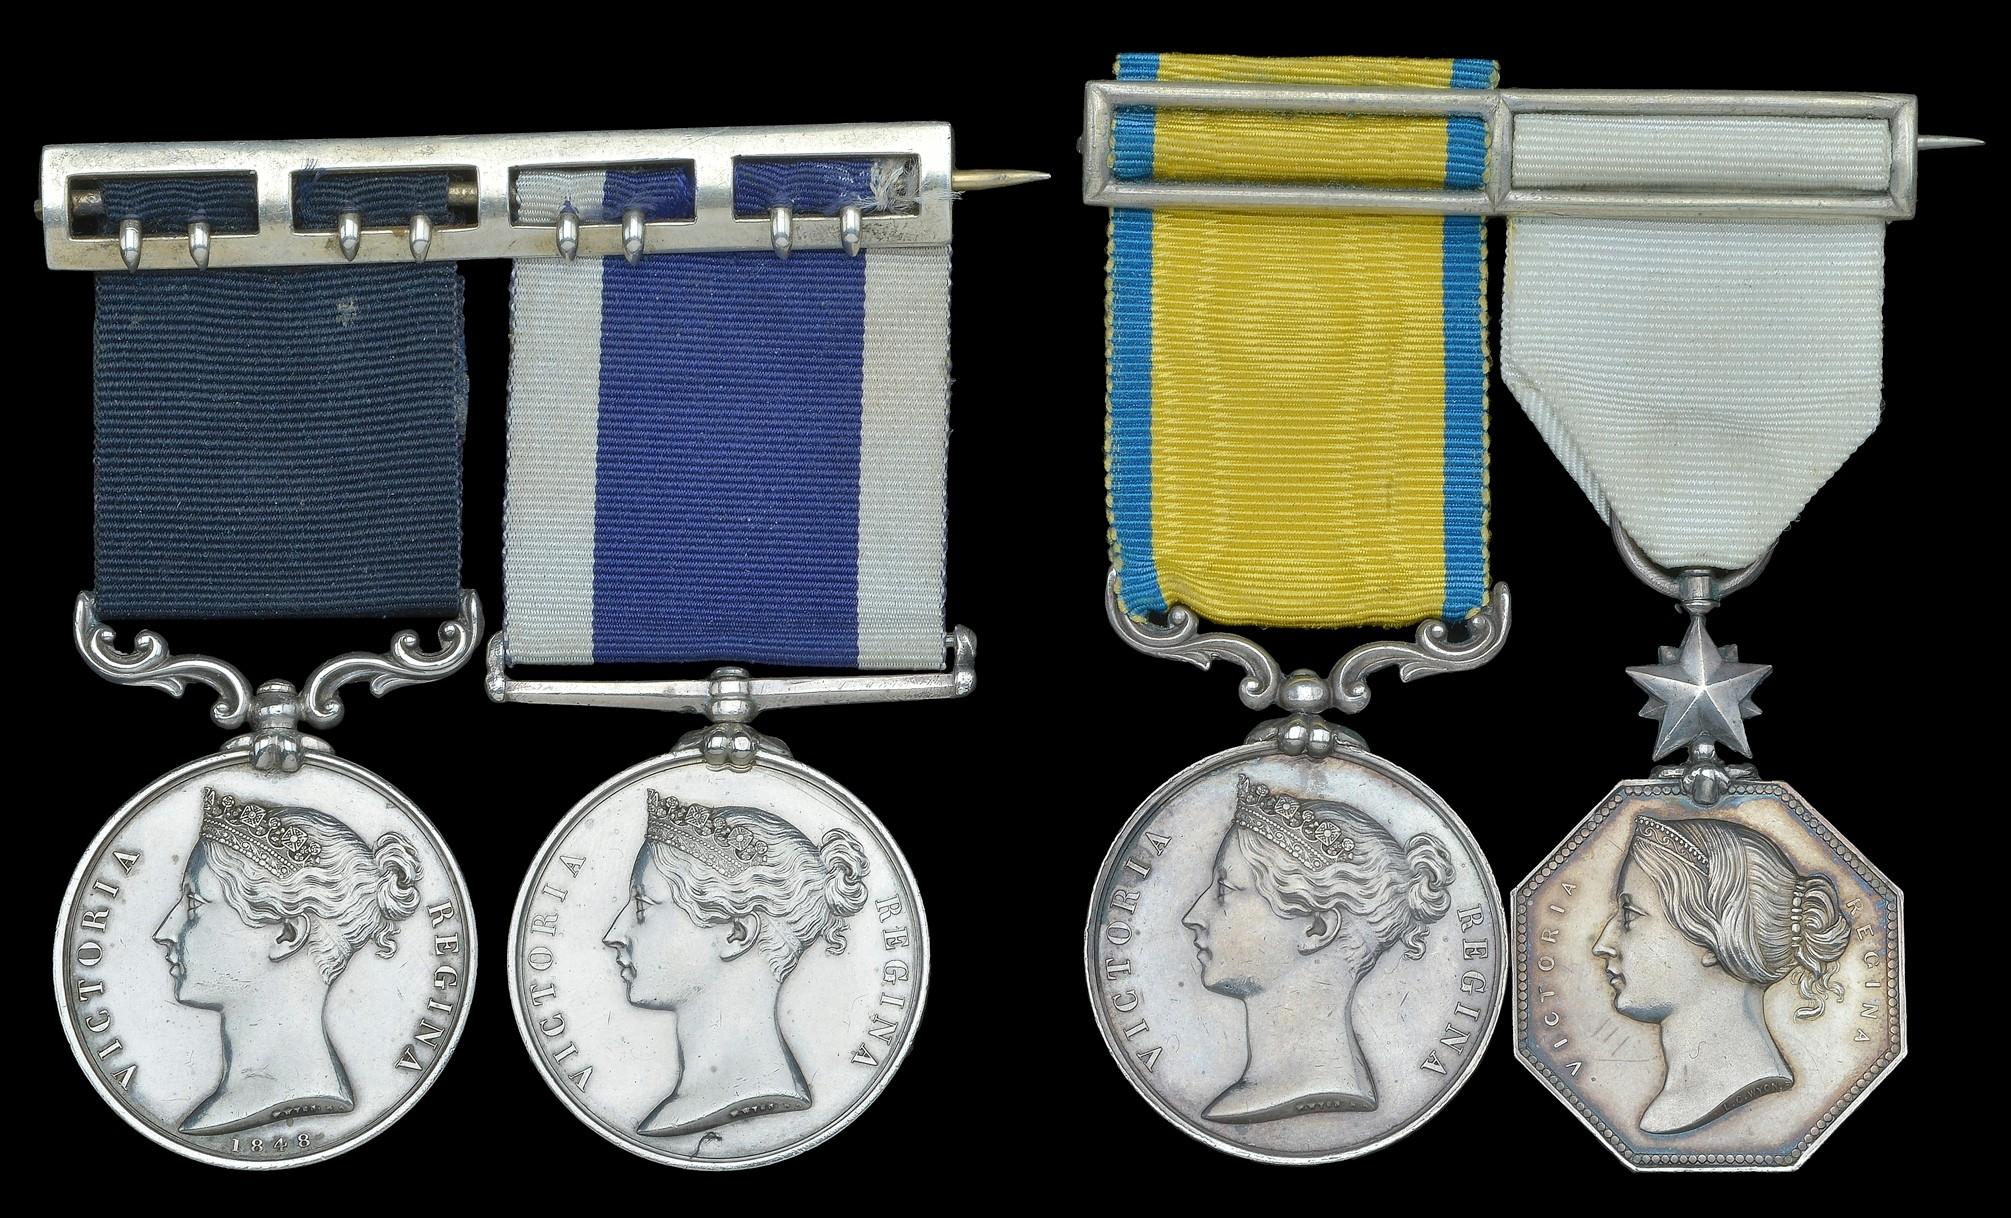 James Adolphus Bute's medals